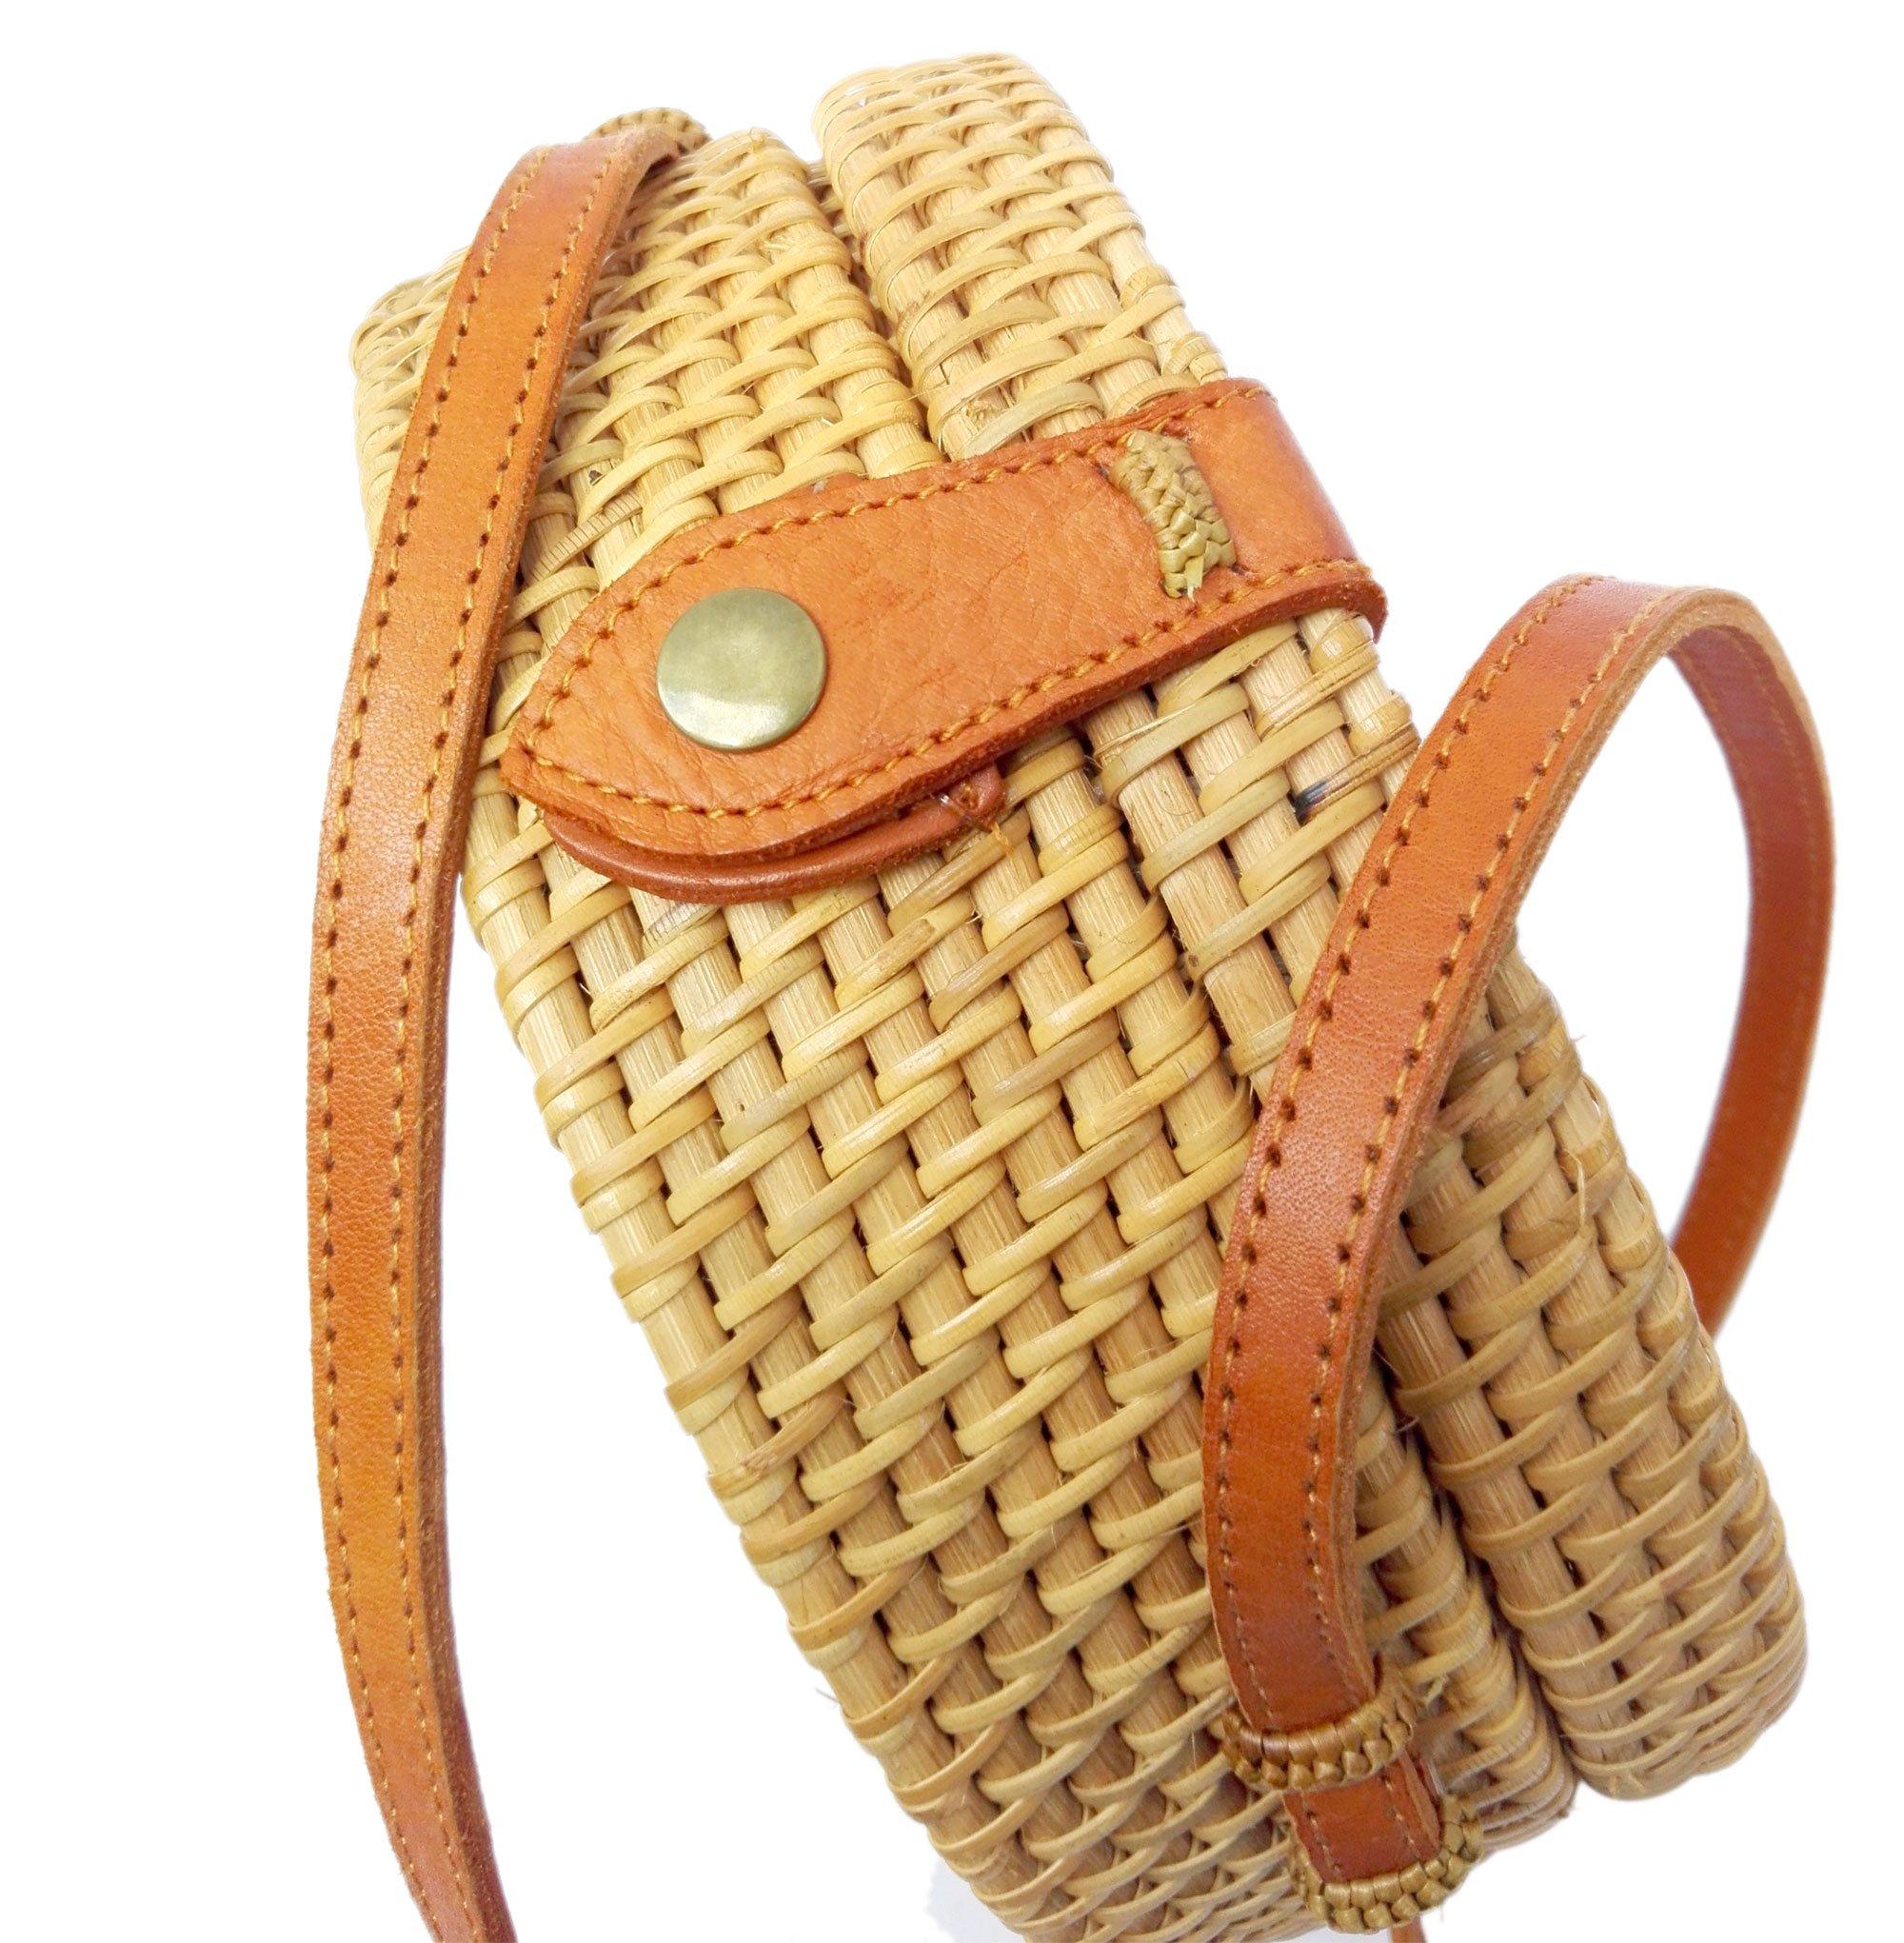 Bali Rattan - Handwoven Round Rattan Bag (Plain Weave Leather Closure) by Bali Rattan (Image #8)